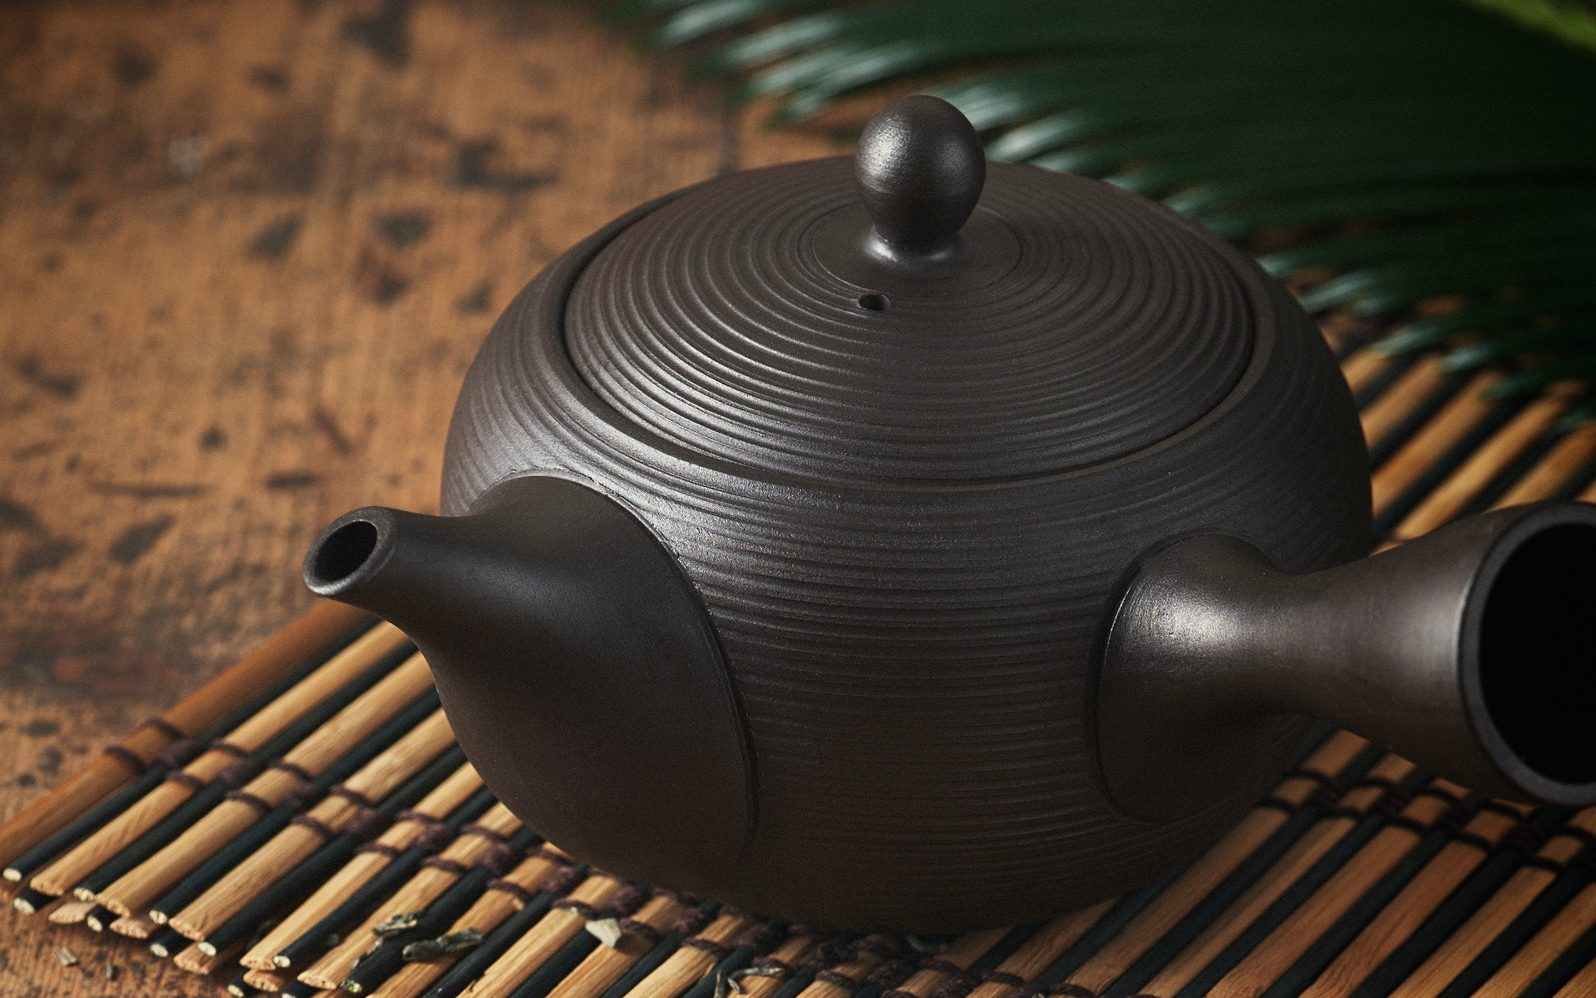 Tea pot, Kyusu, used in making japanese sencha green tea.